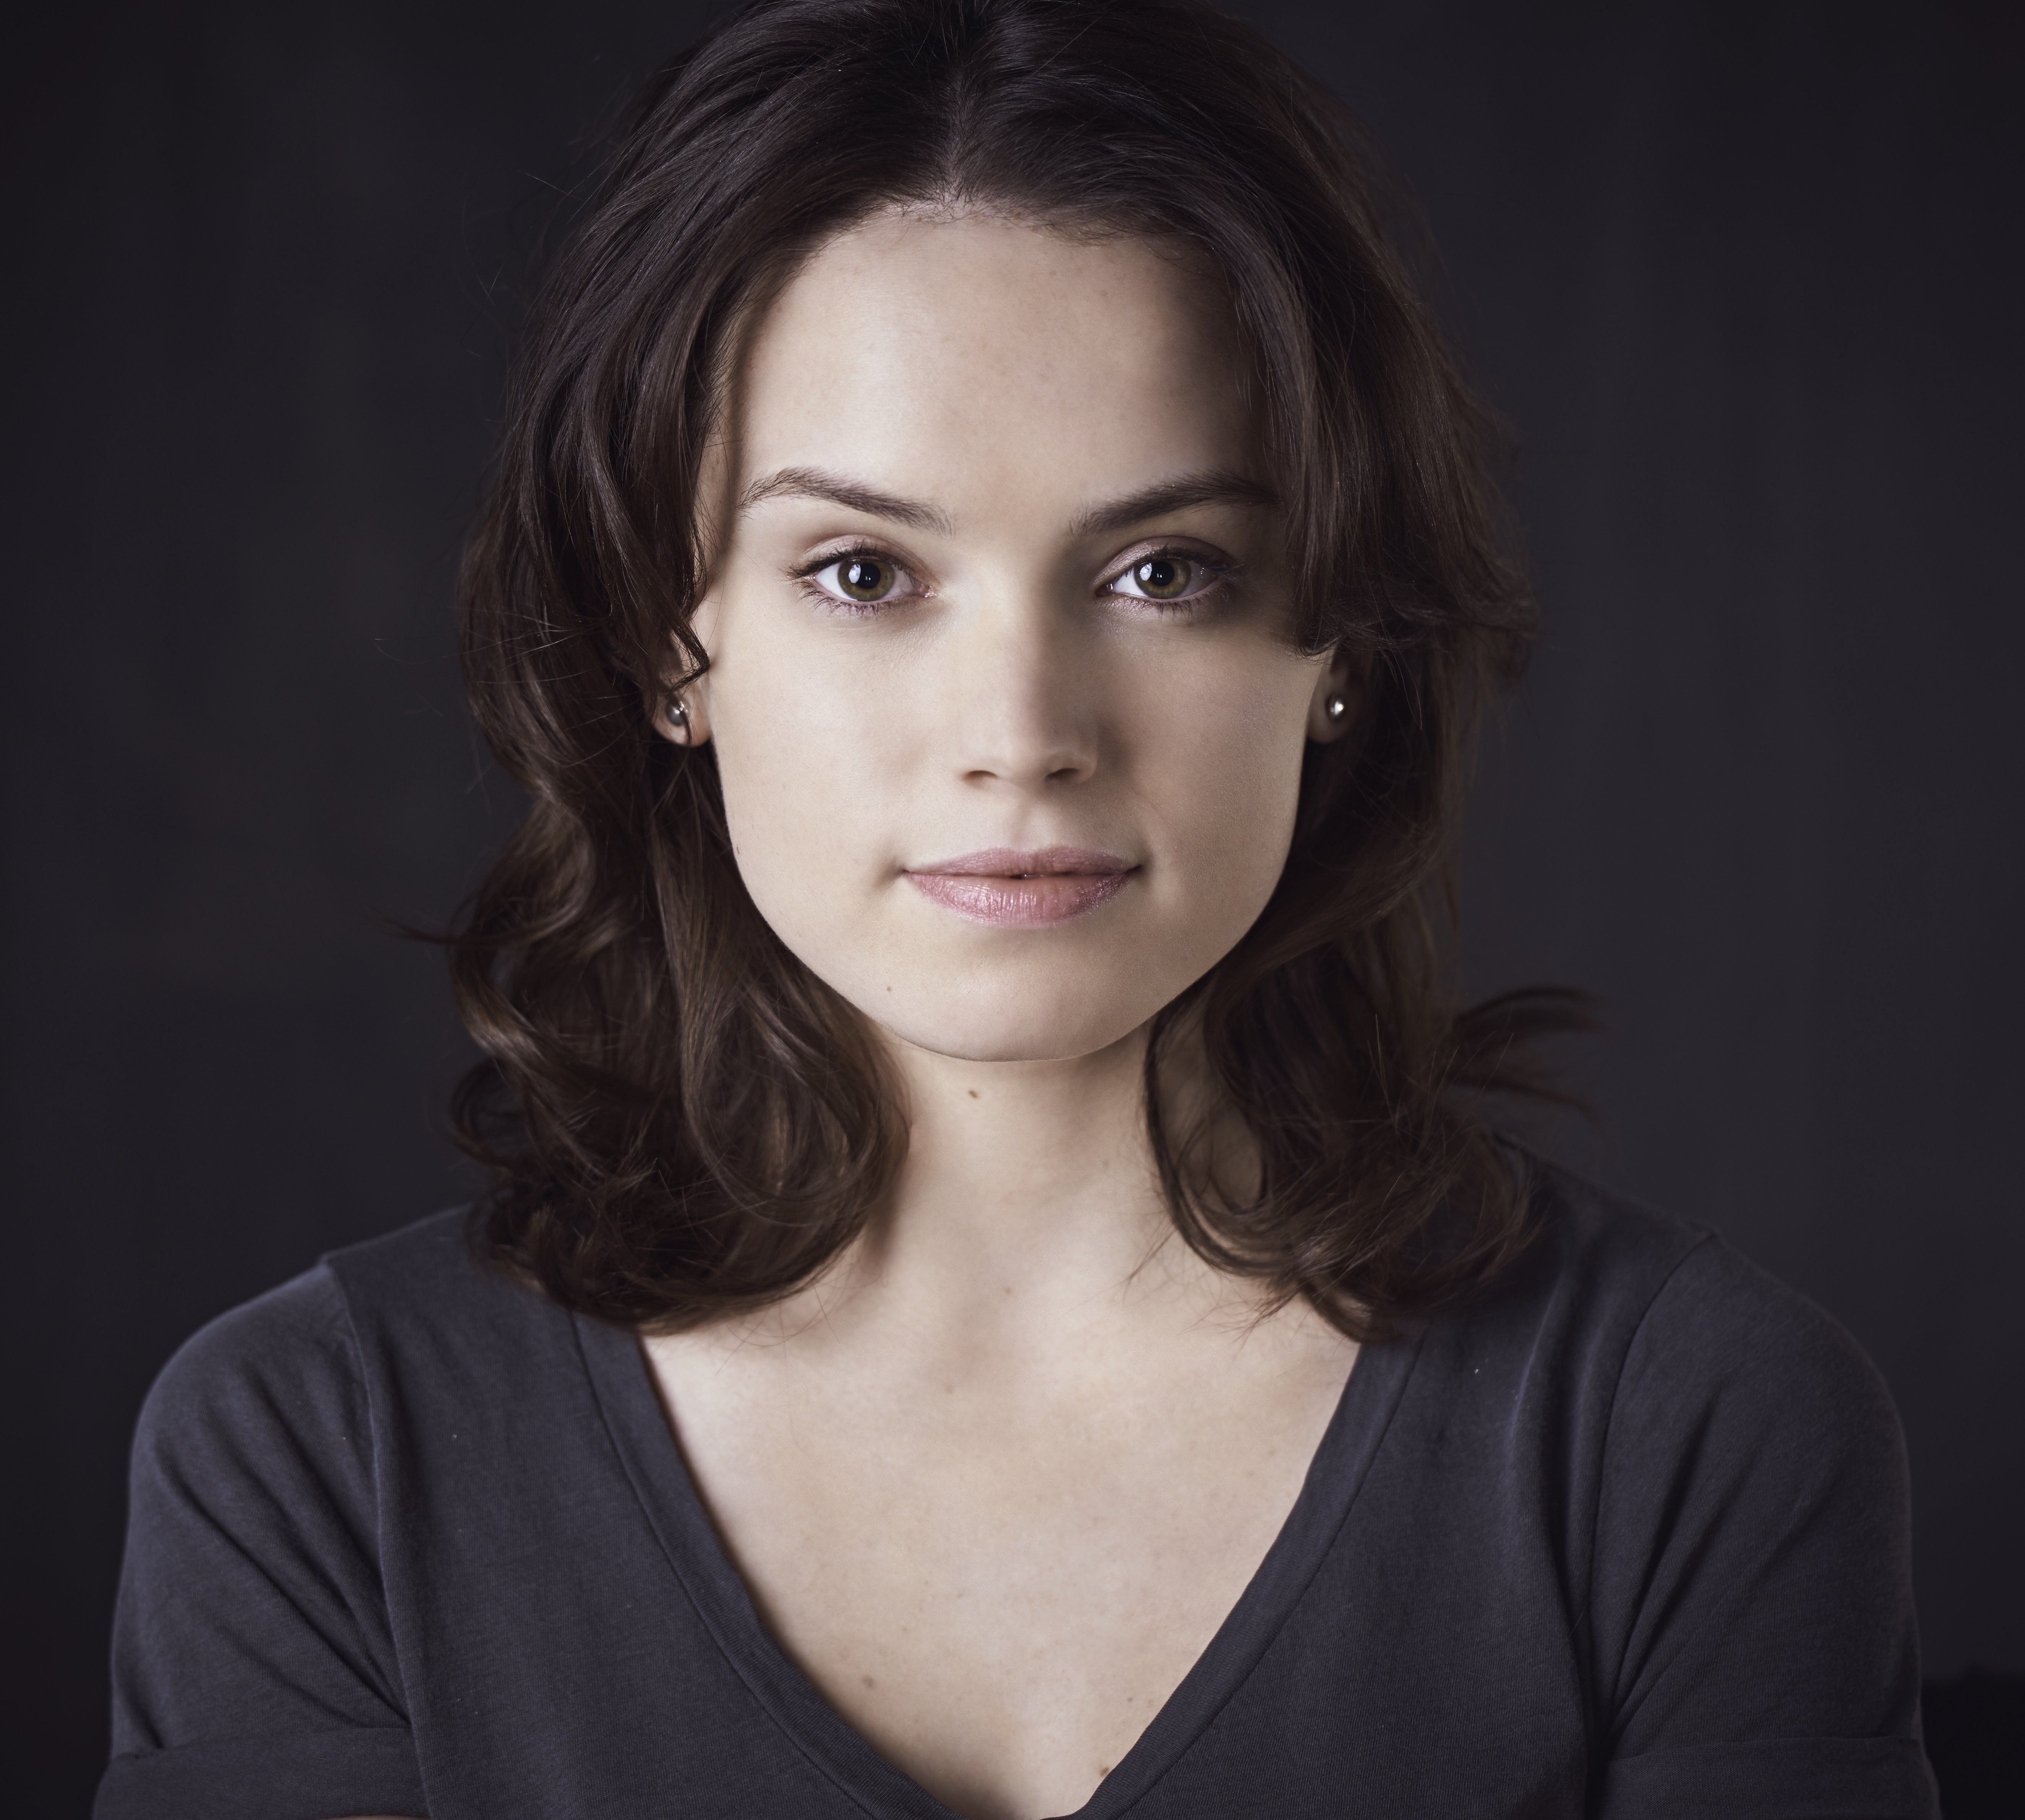 Daisy Ridley age